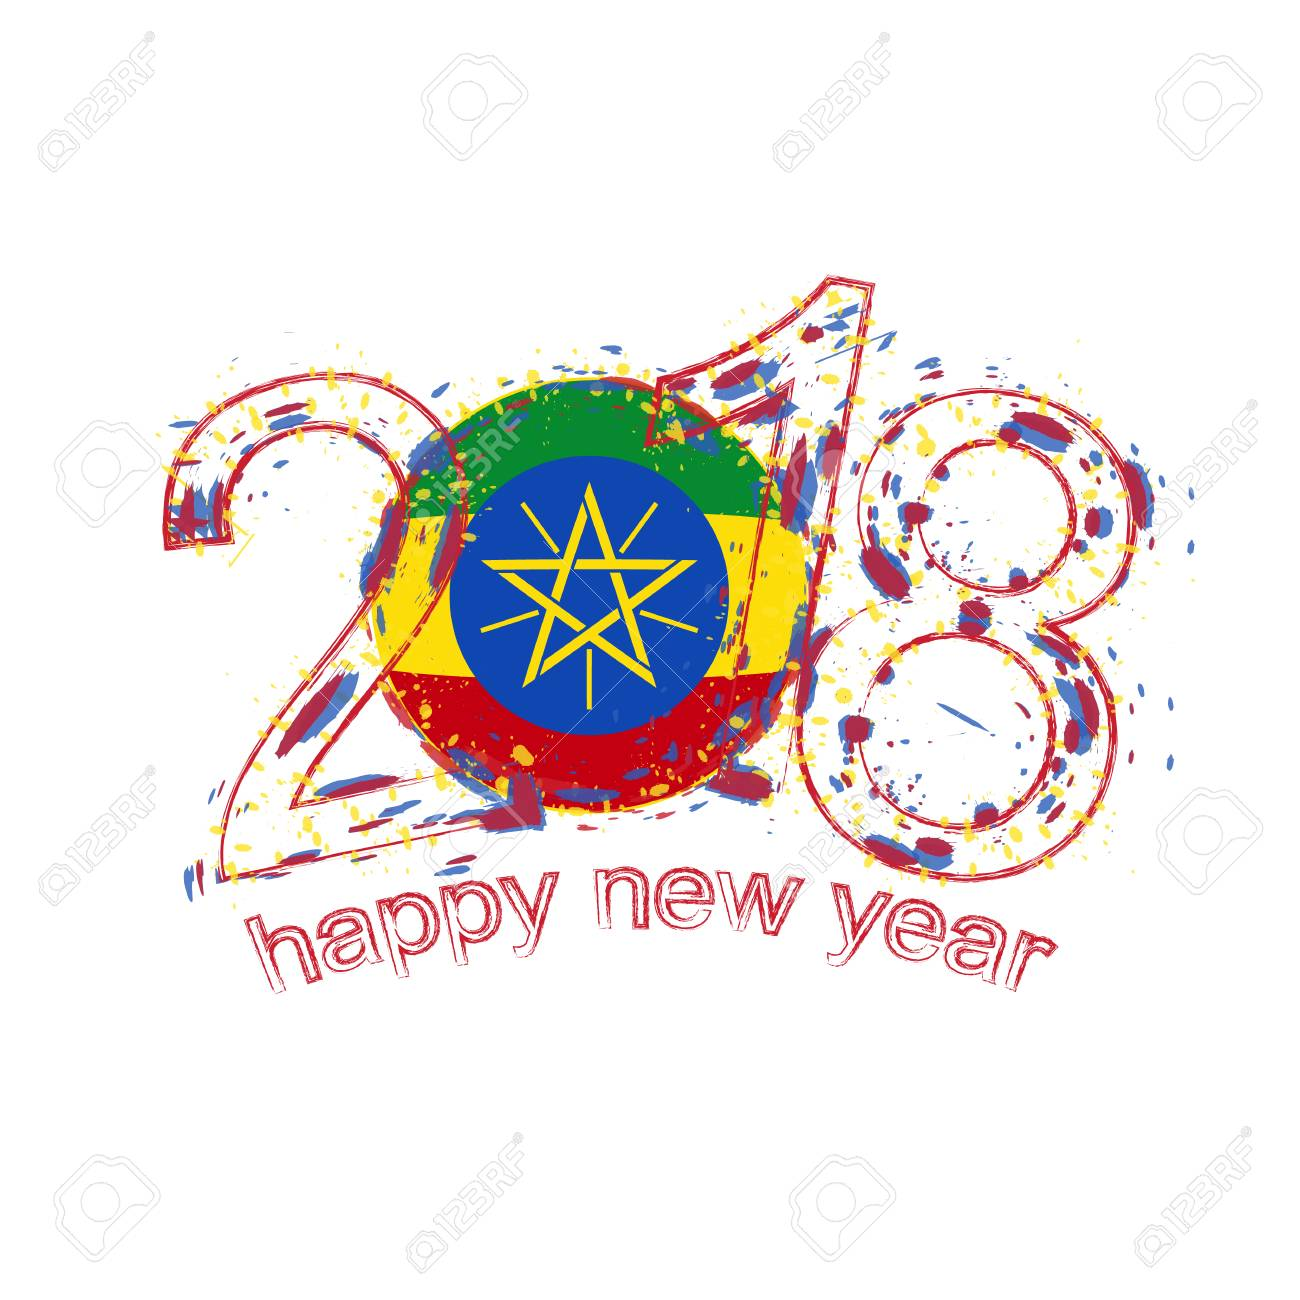 2018 happy new year ethiopia grunge vector template for greeting 2018 happy new year ethiopia grunge vector template for greeting card calendars 2018 seasonal m4hsunfo